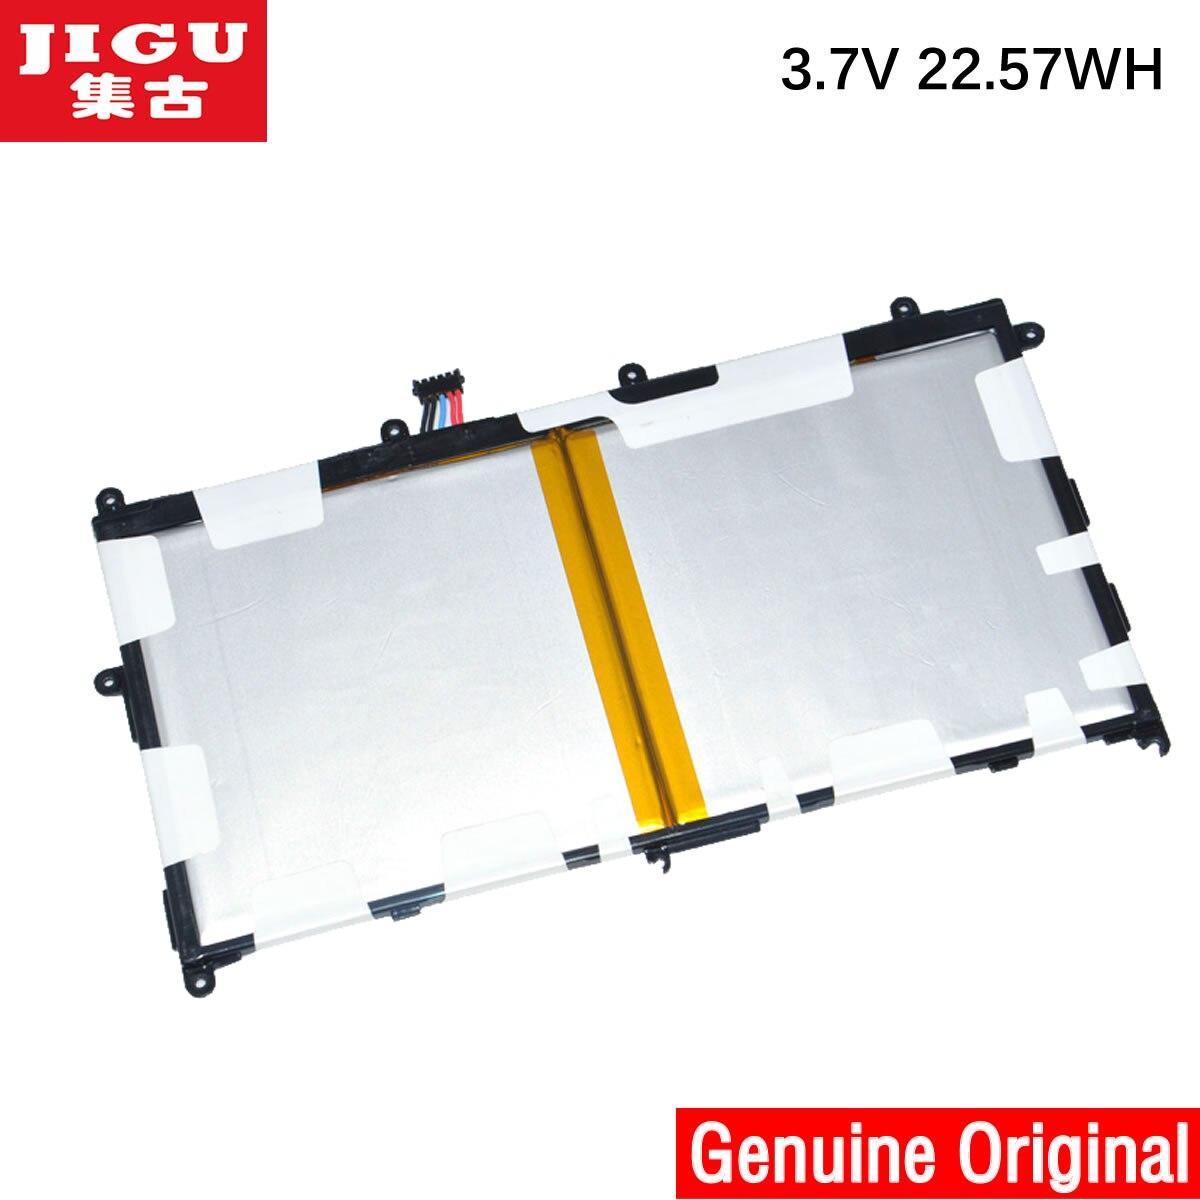 JIGU-بطارية كمبيوتر محمول أصلية SP368487A ، لهاتف SAMSUNG P7300 P739 7310 7320